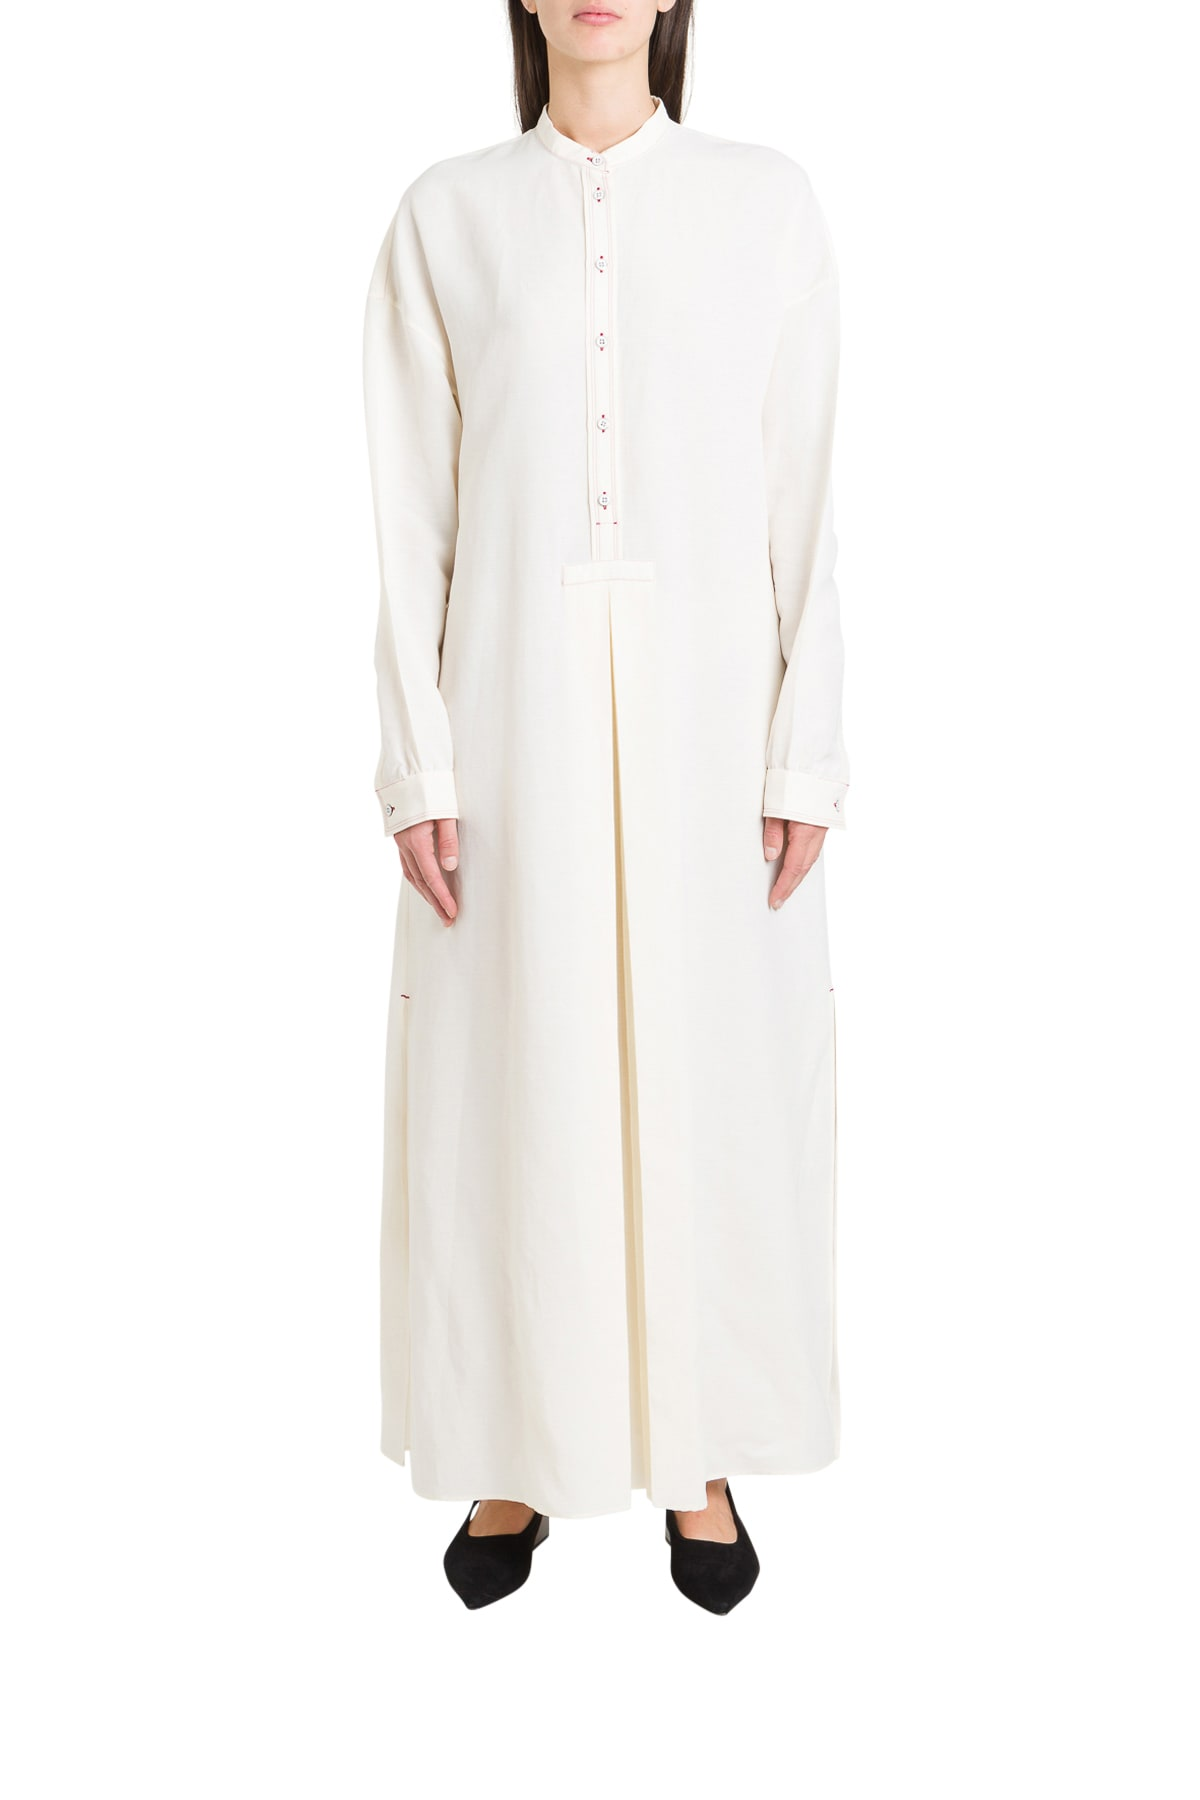 Buy Jil Sander Marina Shirt Dress online, shop Jil Sander with free shipping